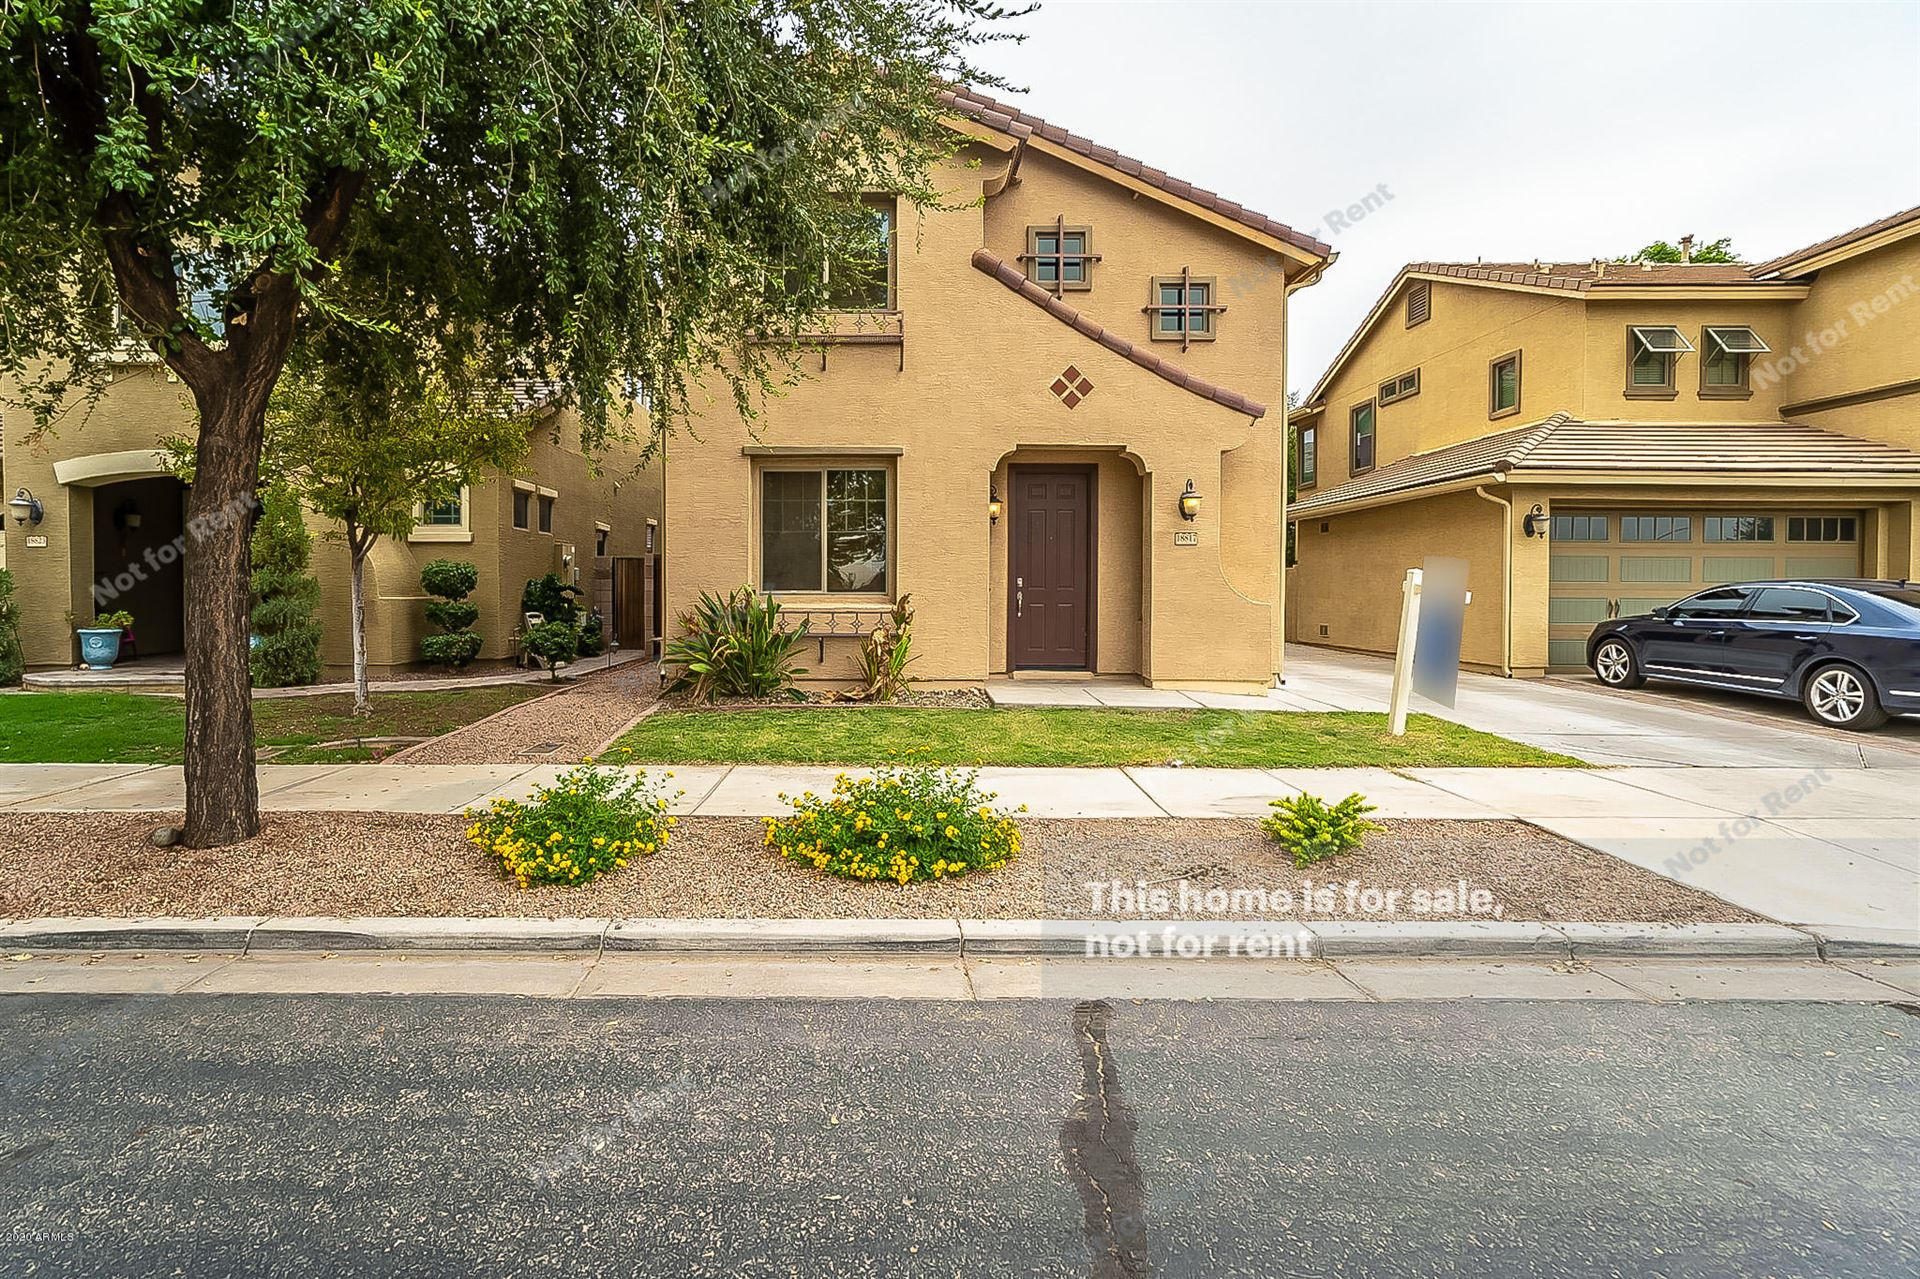 18817 E PELICAN Court, Queen Creek, AZ 85142 - MLS#: 6131570